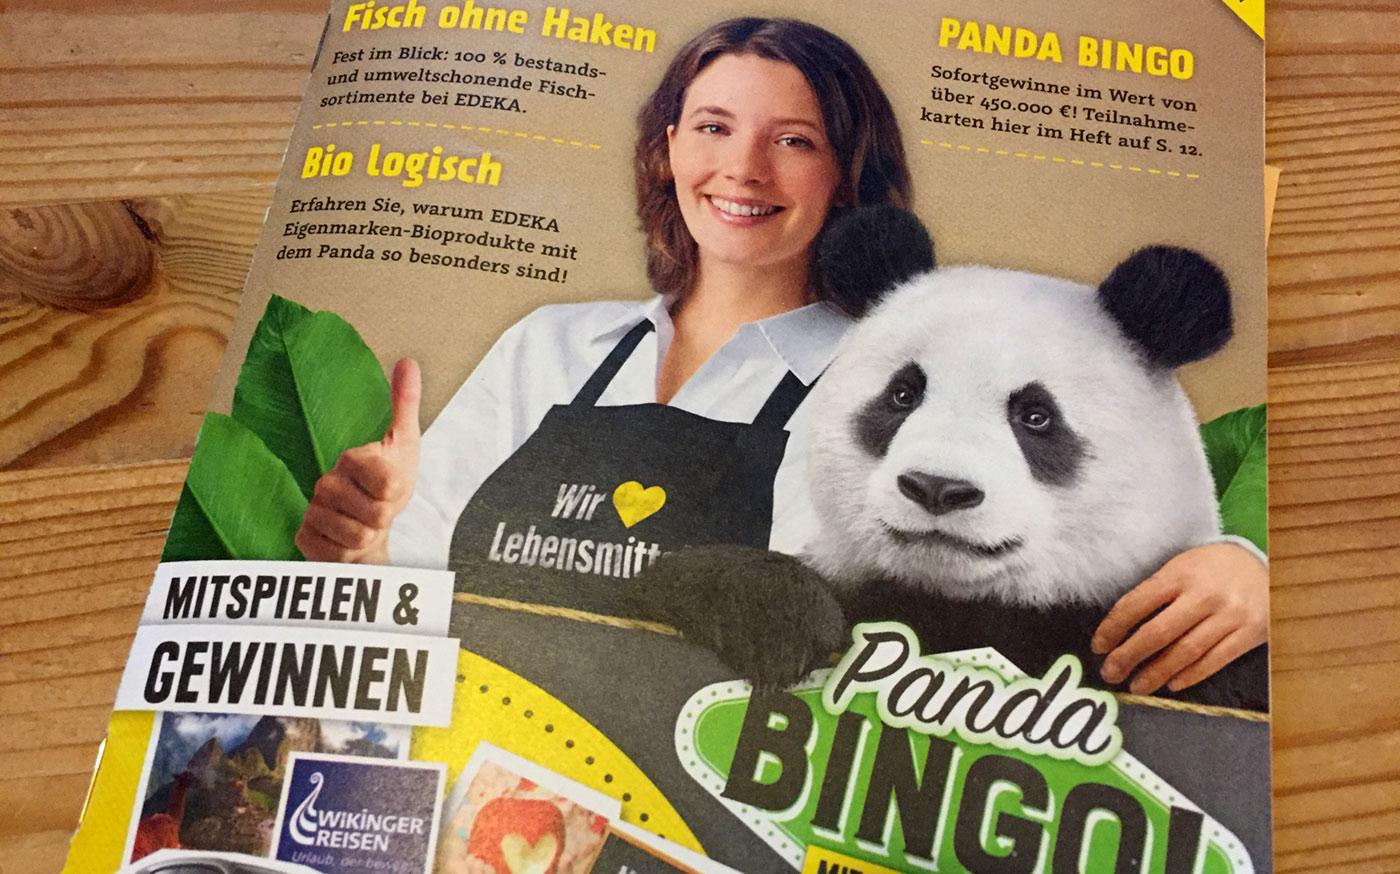 edeka_werbung_falscher_arm